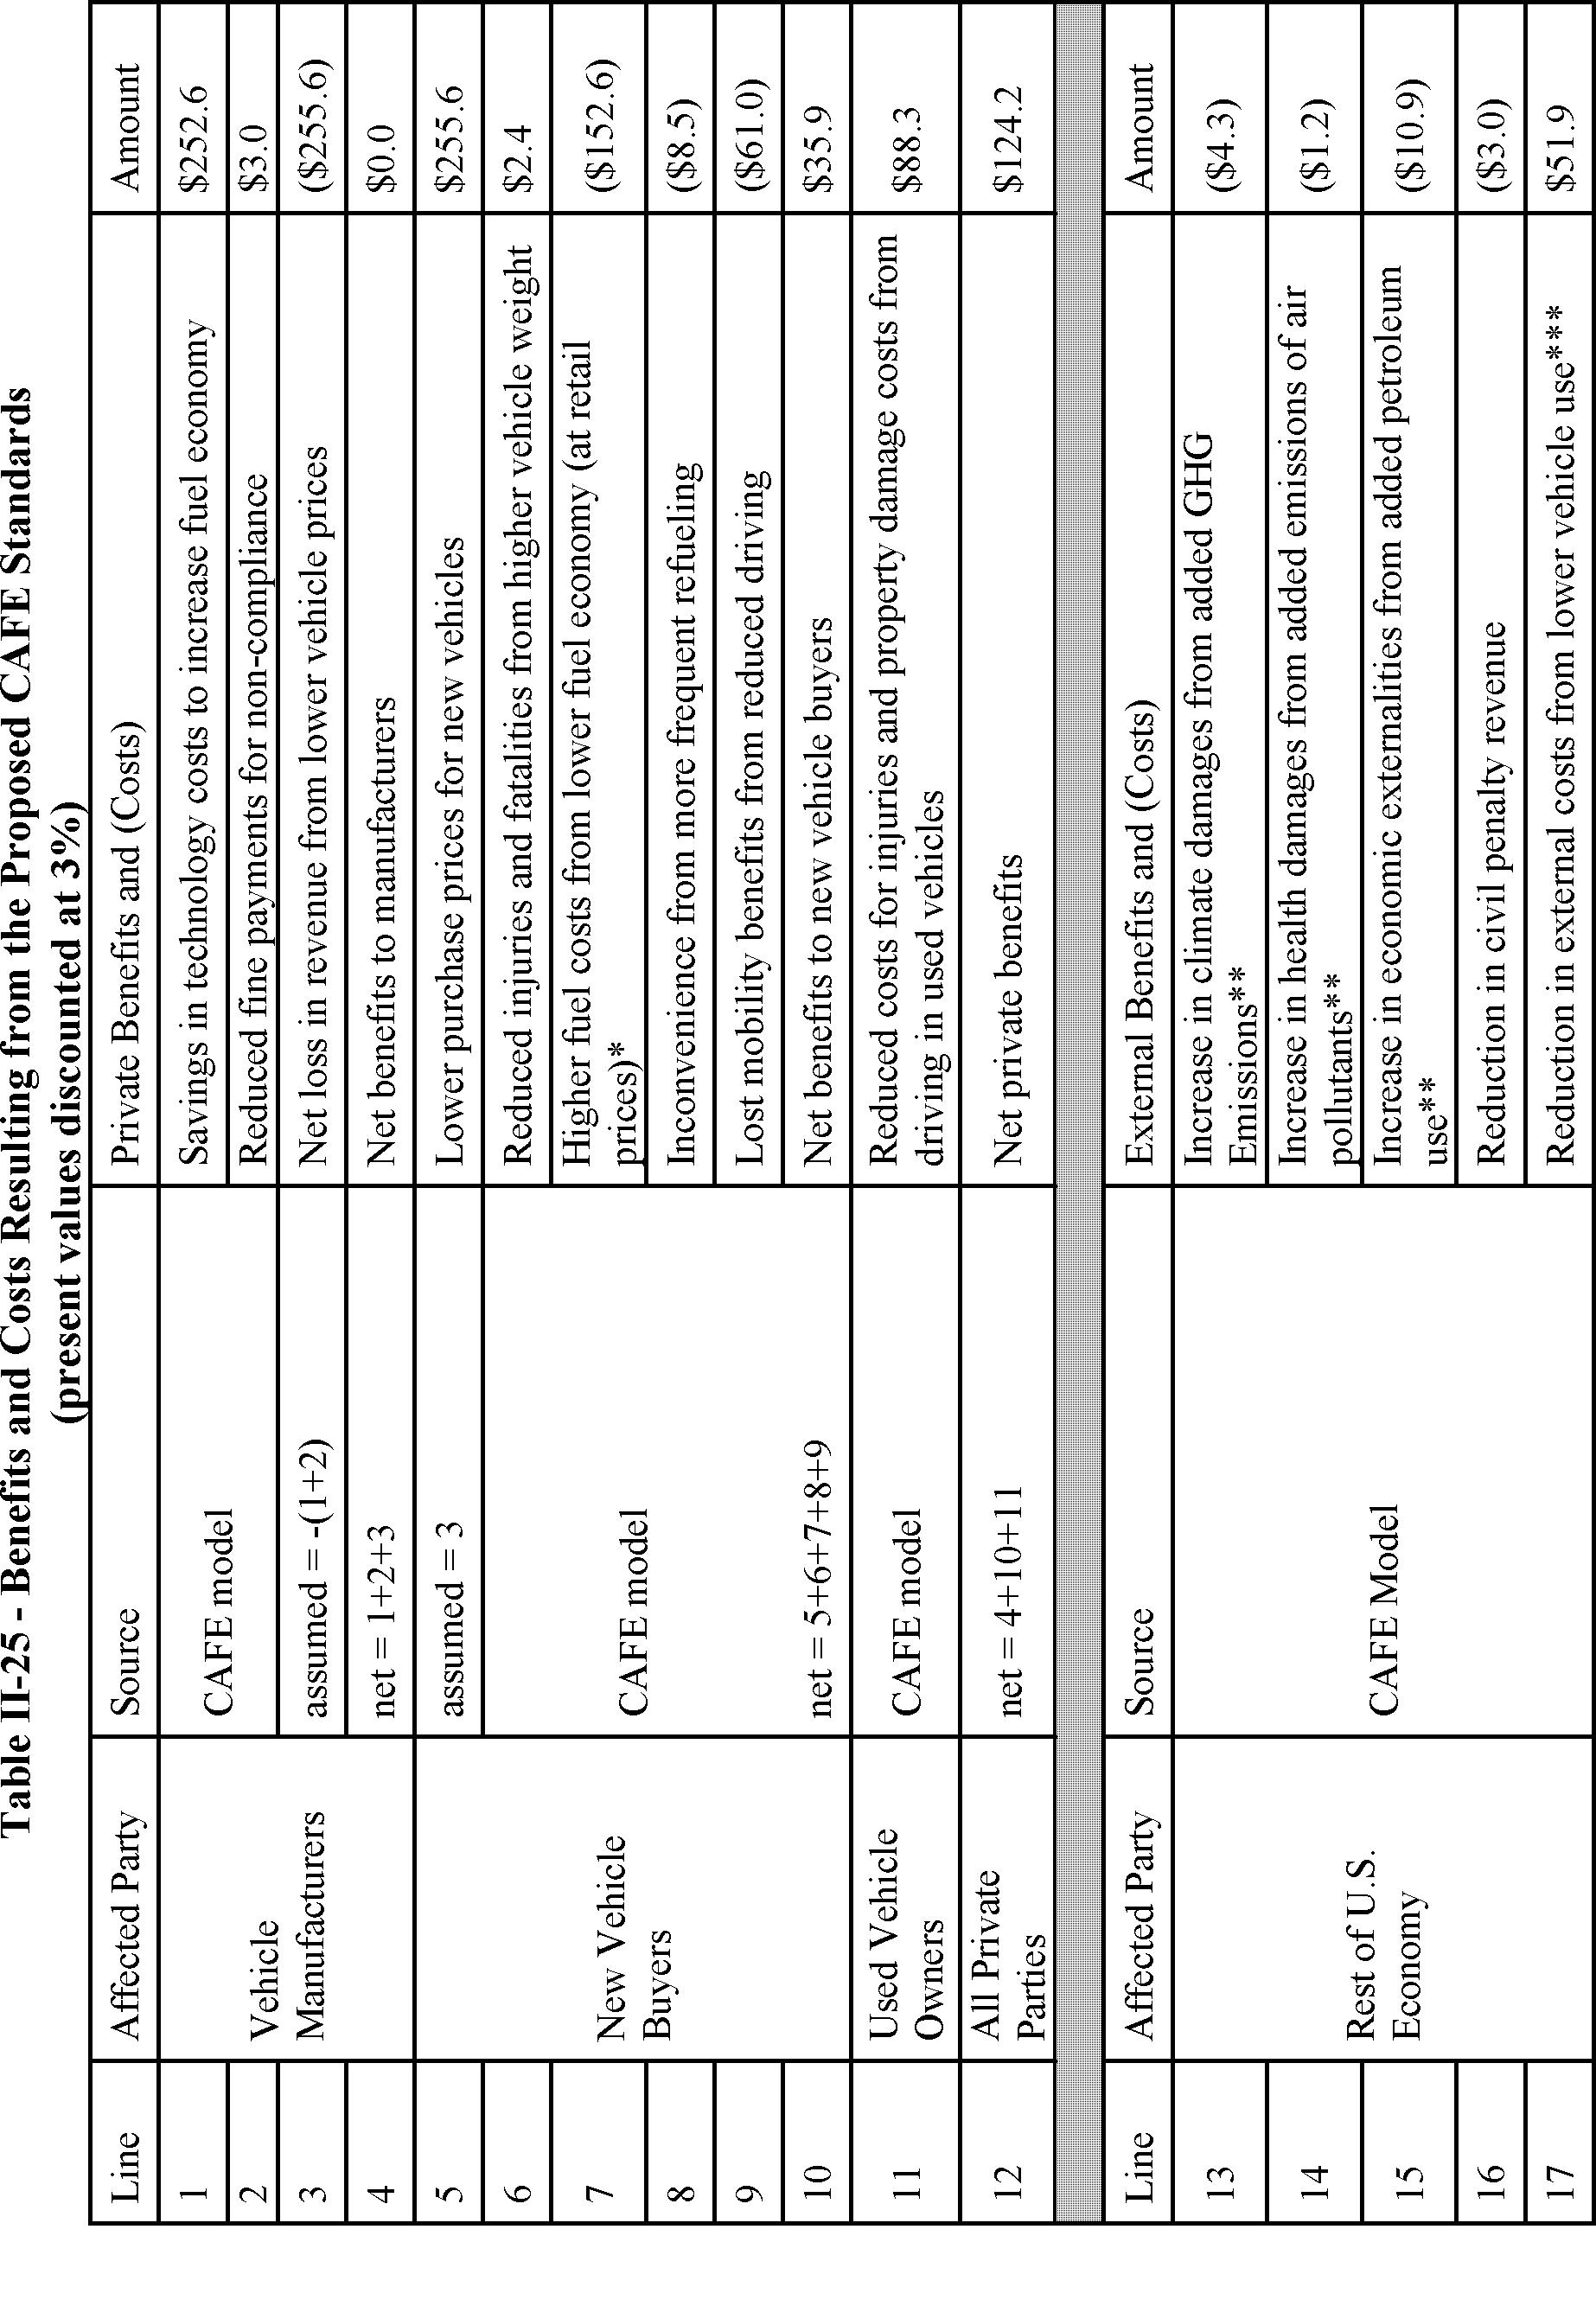 Charging Circuit Diagram Of 1979 Gmc Light Duty Truck Series 10 35